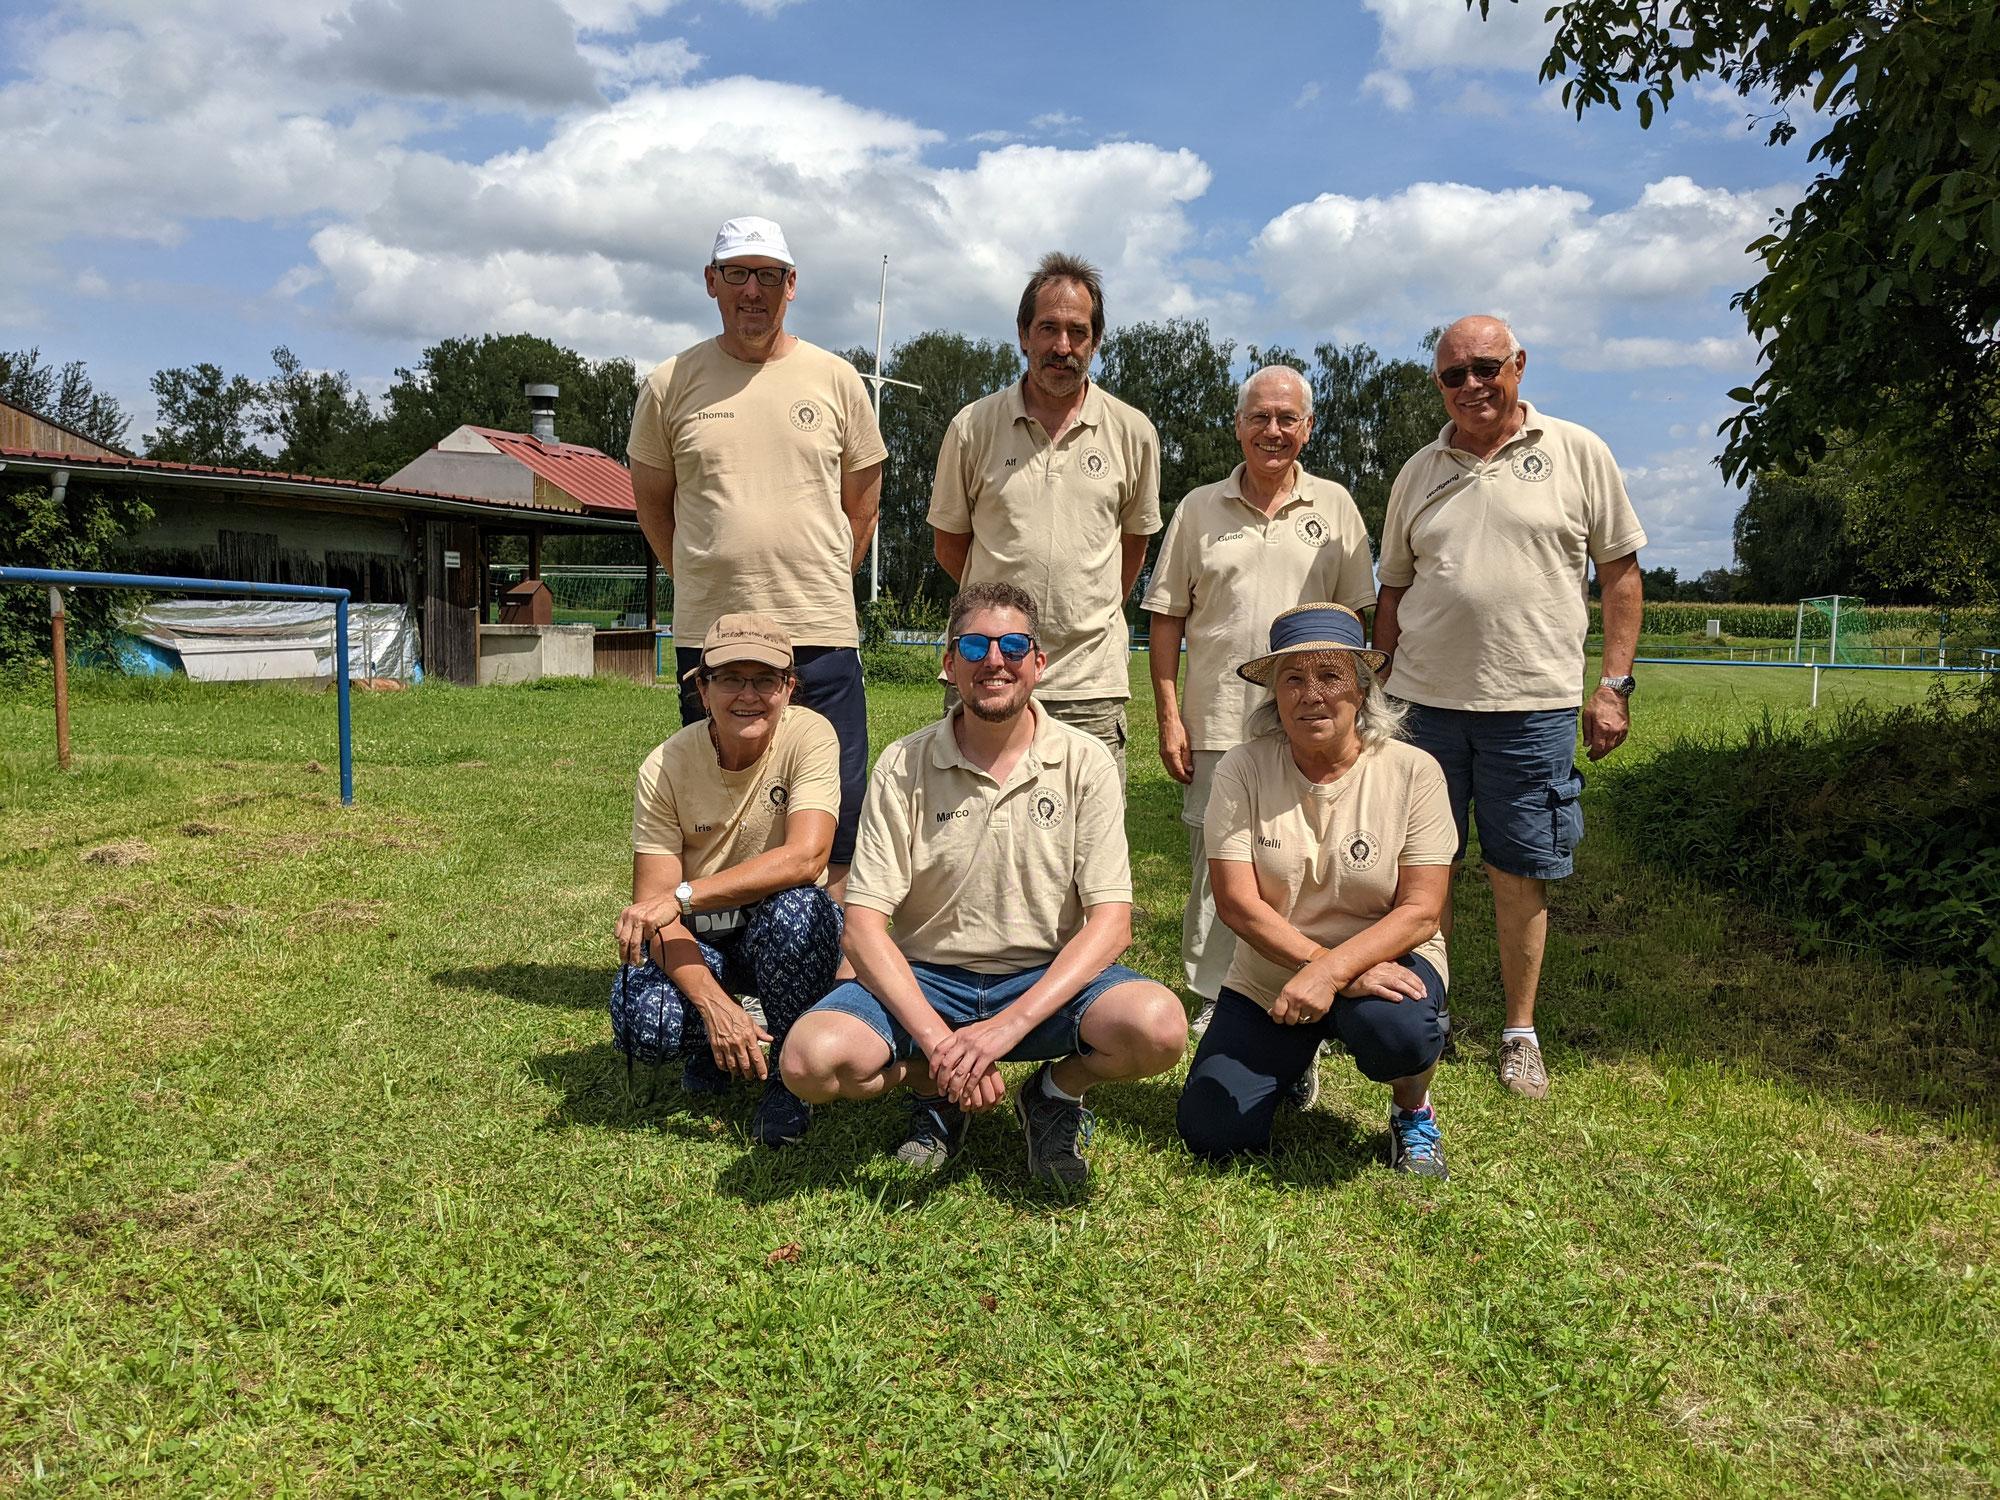 Ligapokal-Spiel: Rheinau 2 : Eggenstein 3, 31.7.21